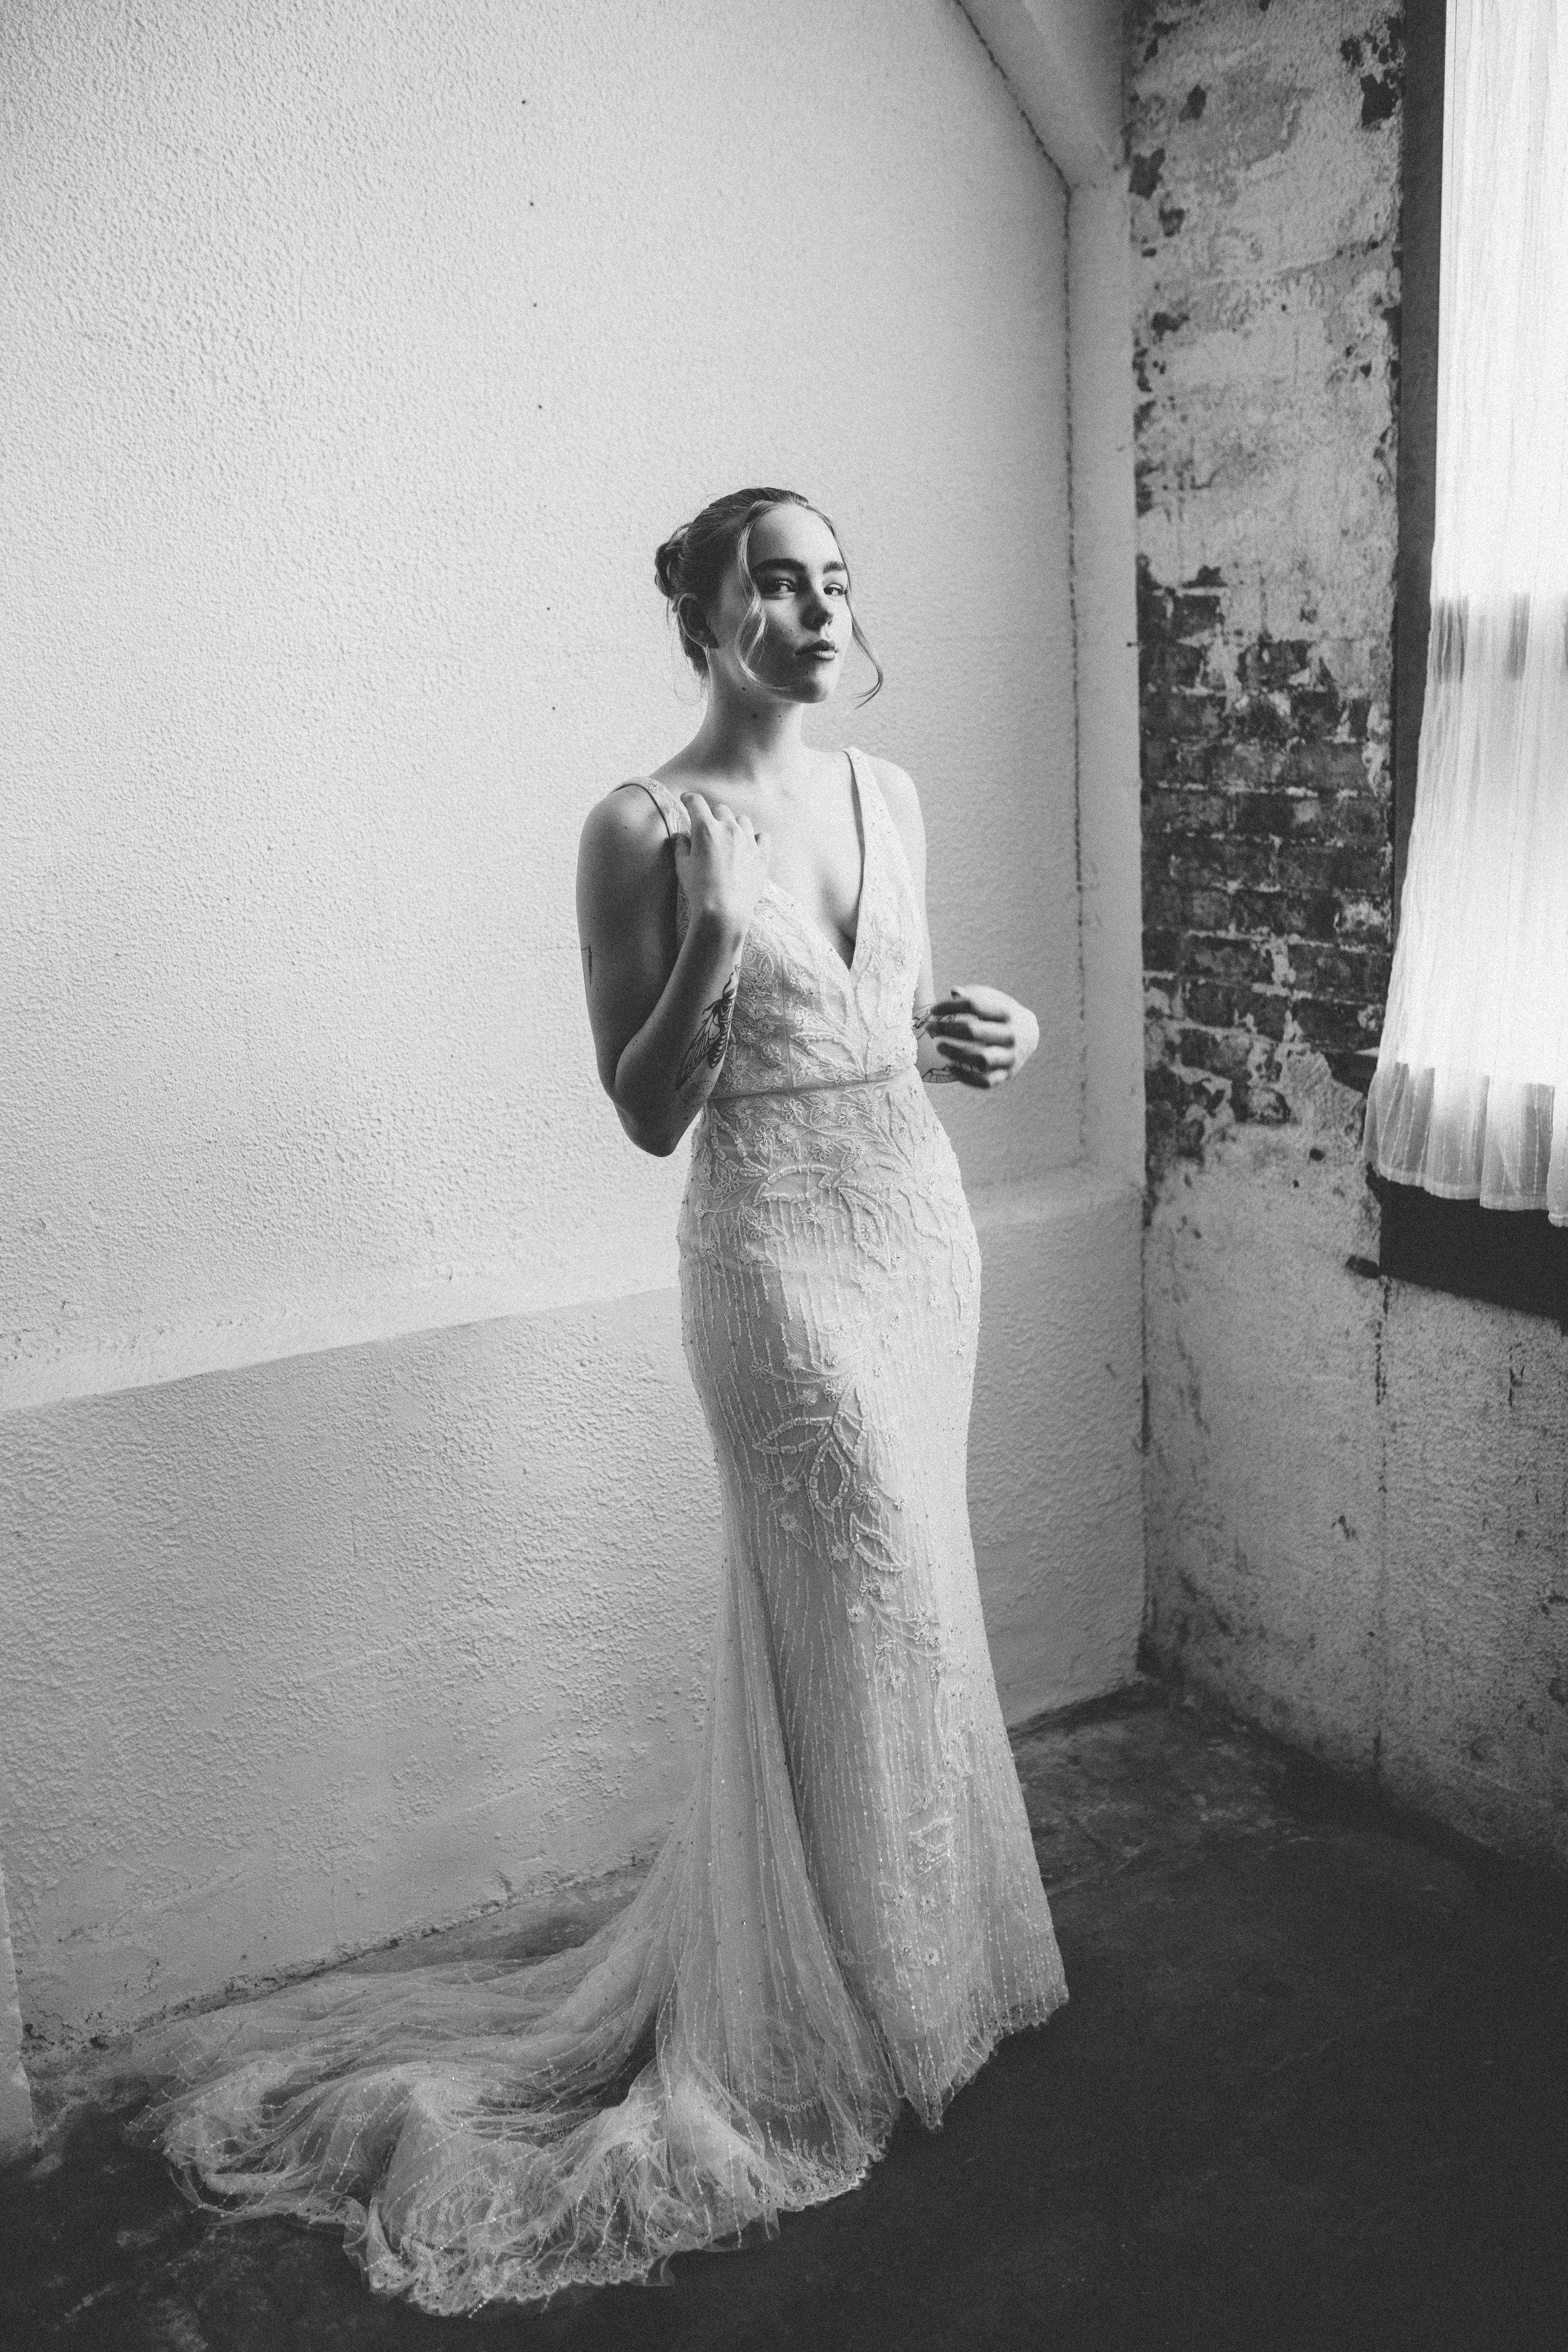 portland-wedding-photographer-3.jpg